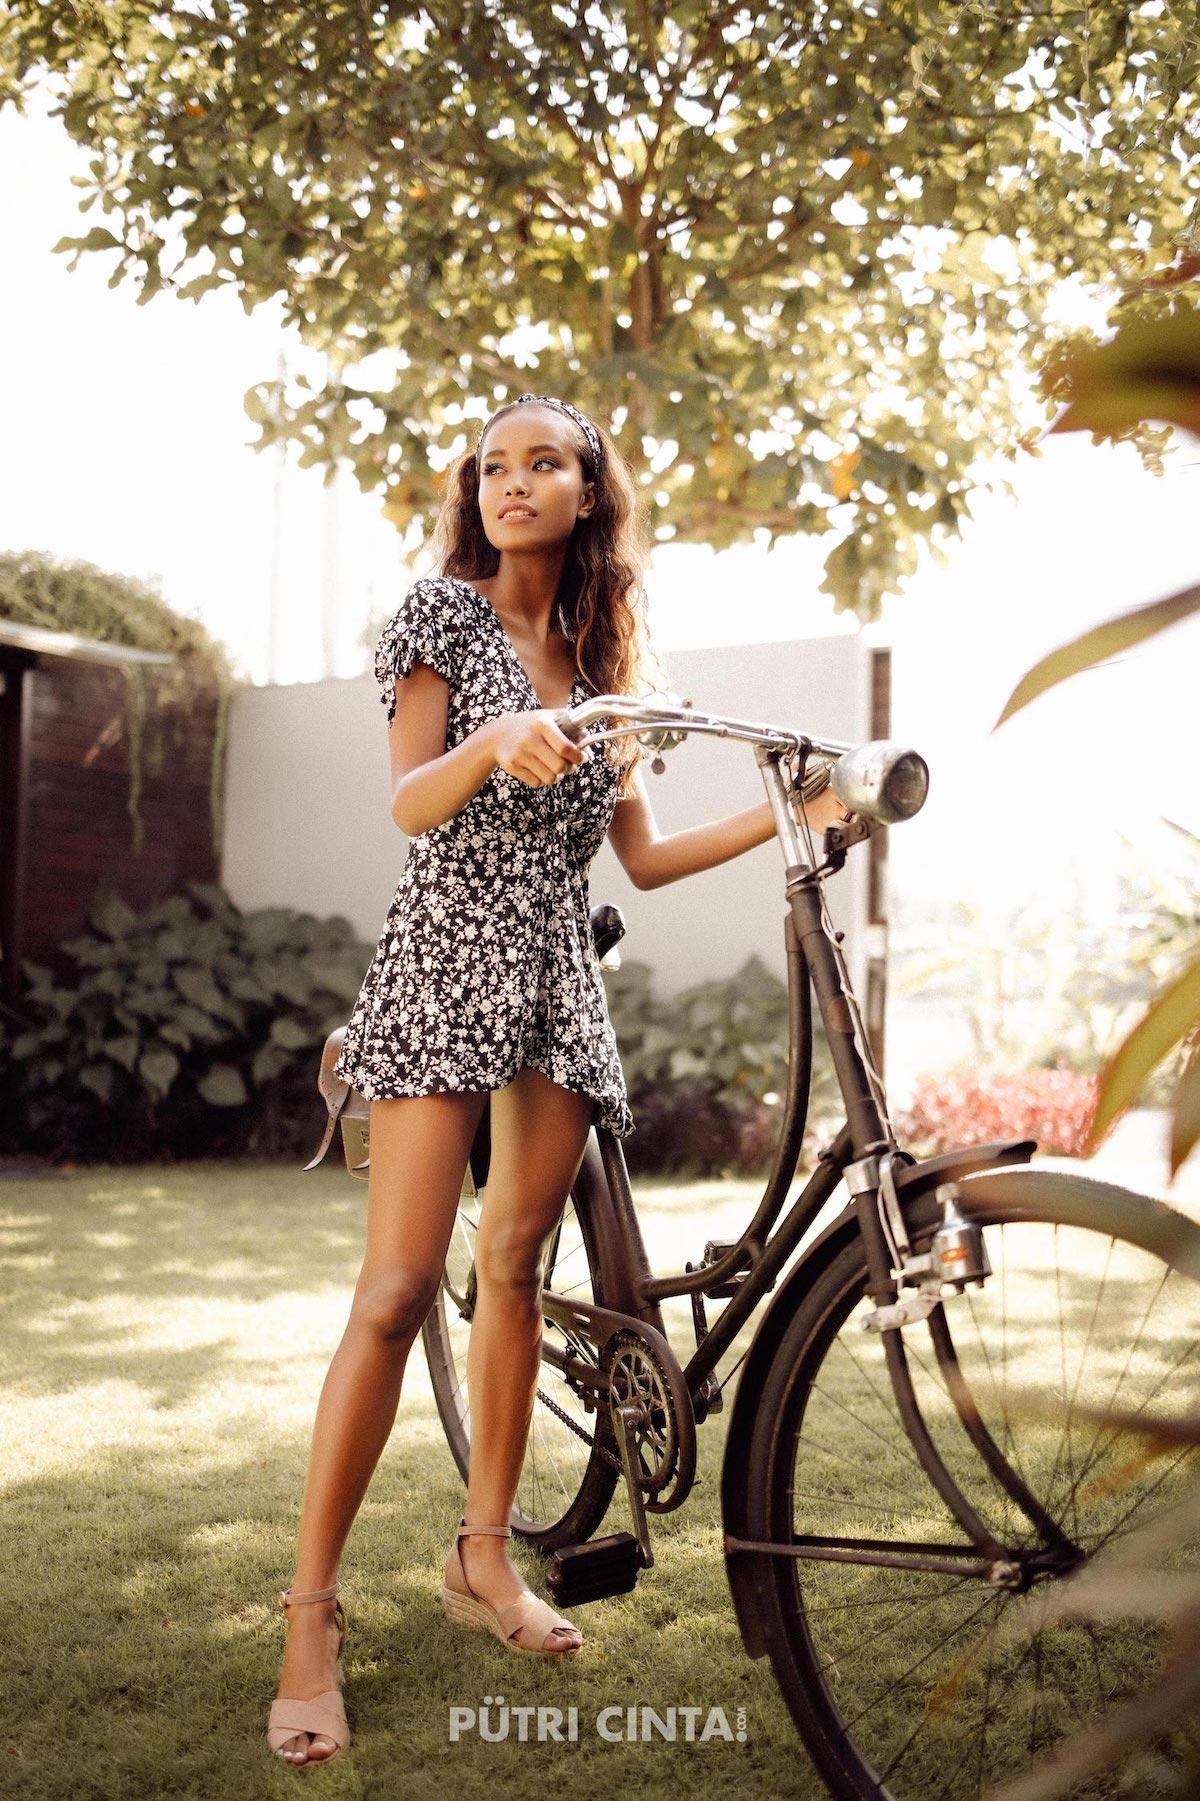 024-Putri-Cinta-Cycling-Commando-photoset-23.jpg